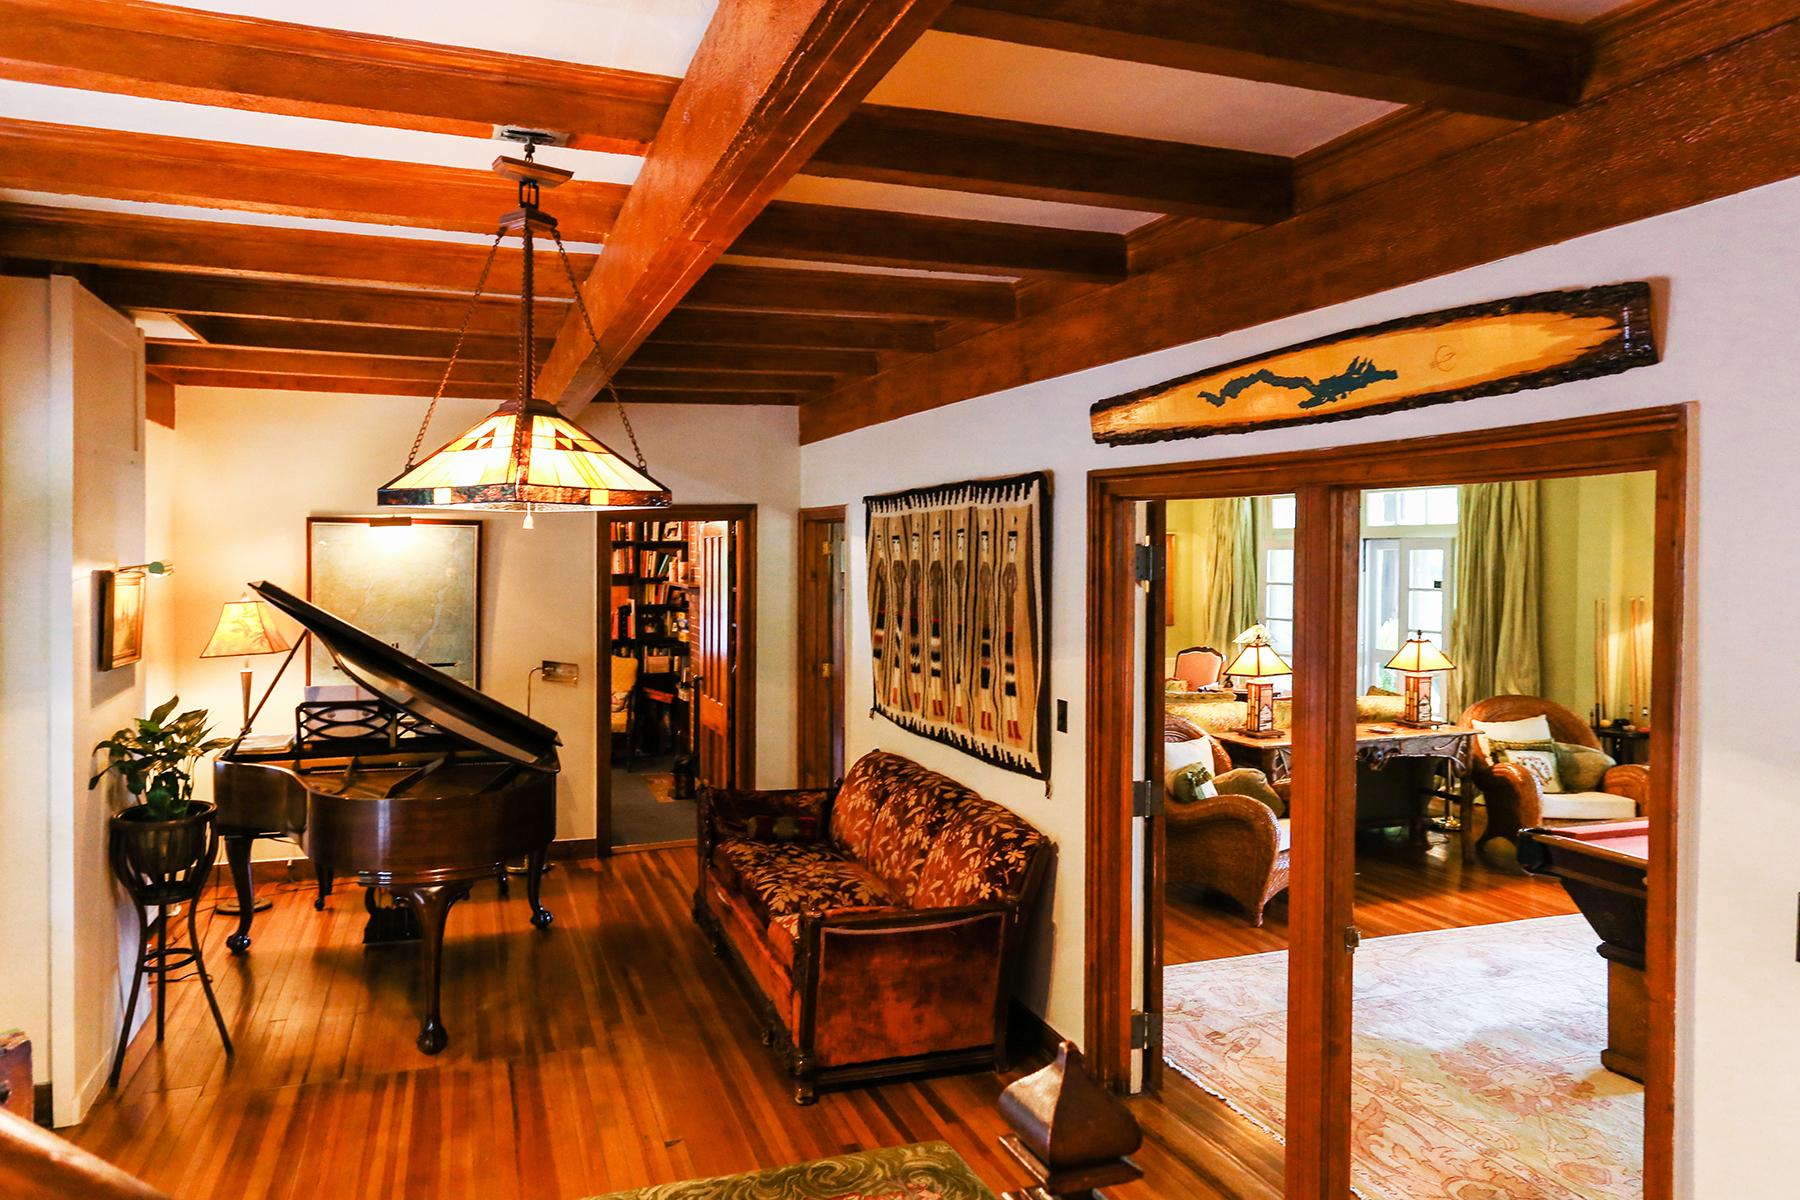 Additional photo for property listing at High Point 5078-5080  Lake Shore Dr Bolton Landing, Nueva York 12814 Estados Unidos